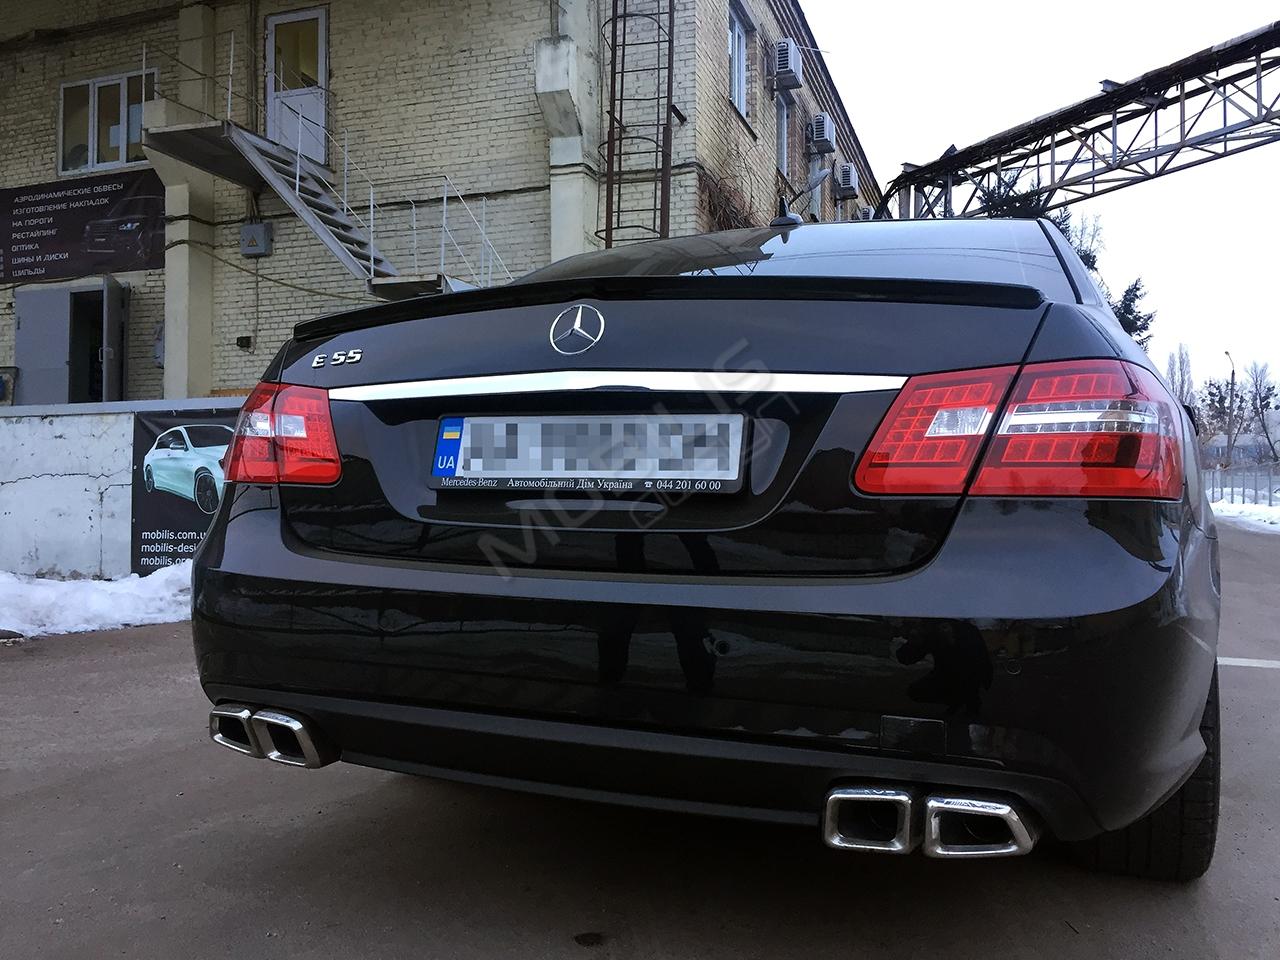 Mercedes-Benz E 350 2011 - установка диффузора и насадок на гулишетель E55 от AMG